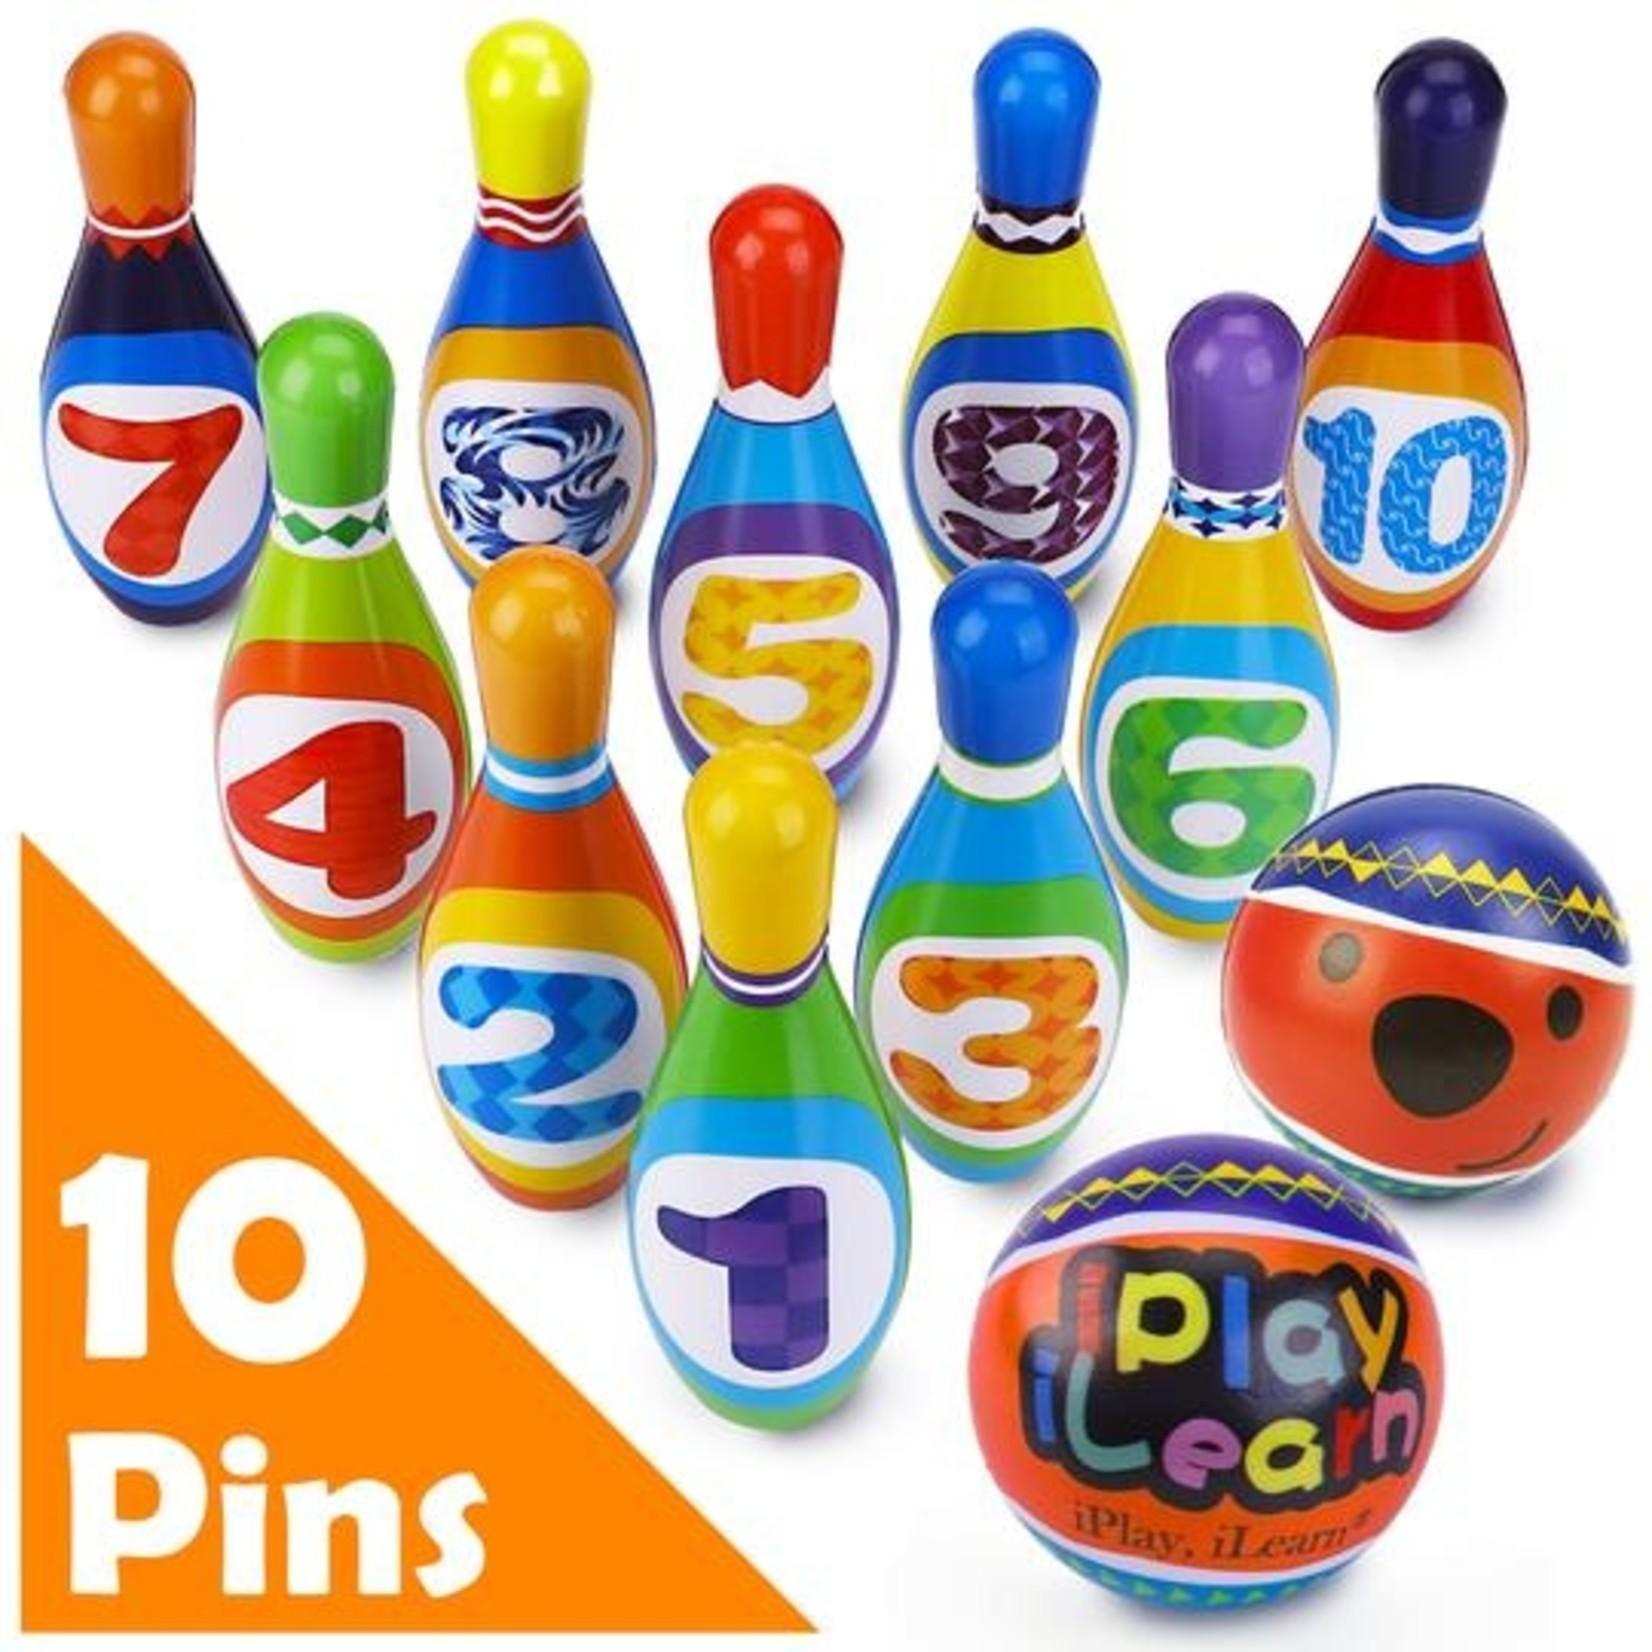 iplay i learn Bowling